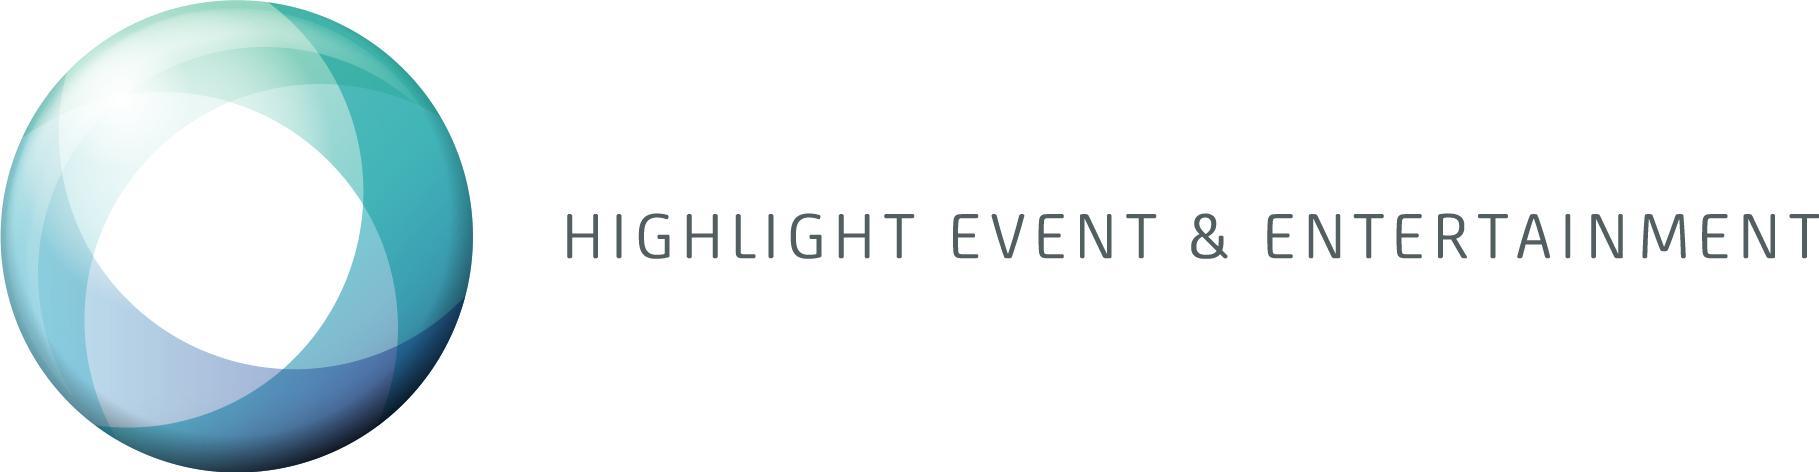 Highlight Event & Entertainment